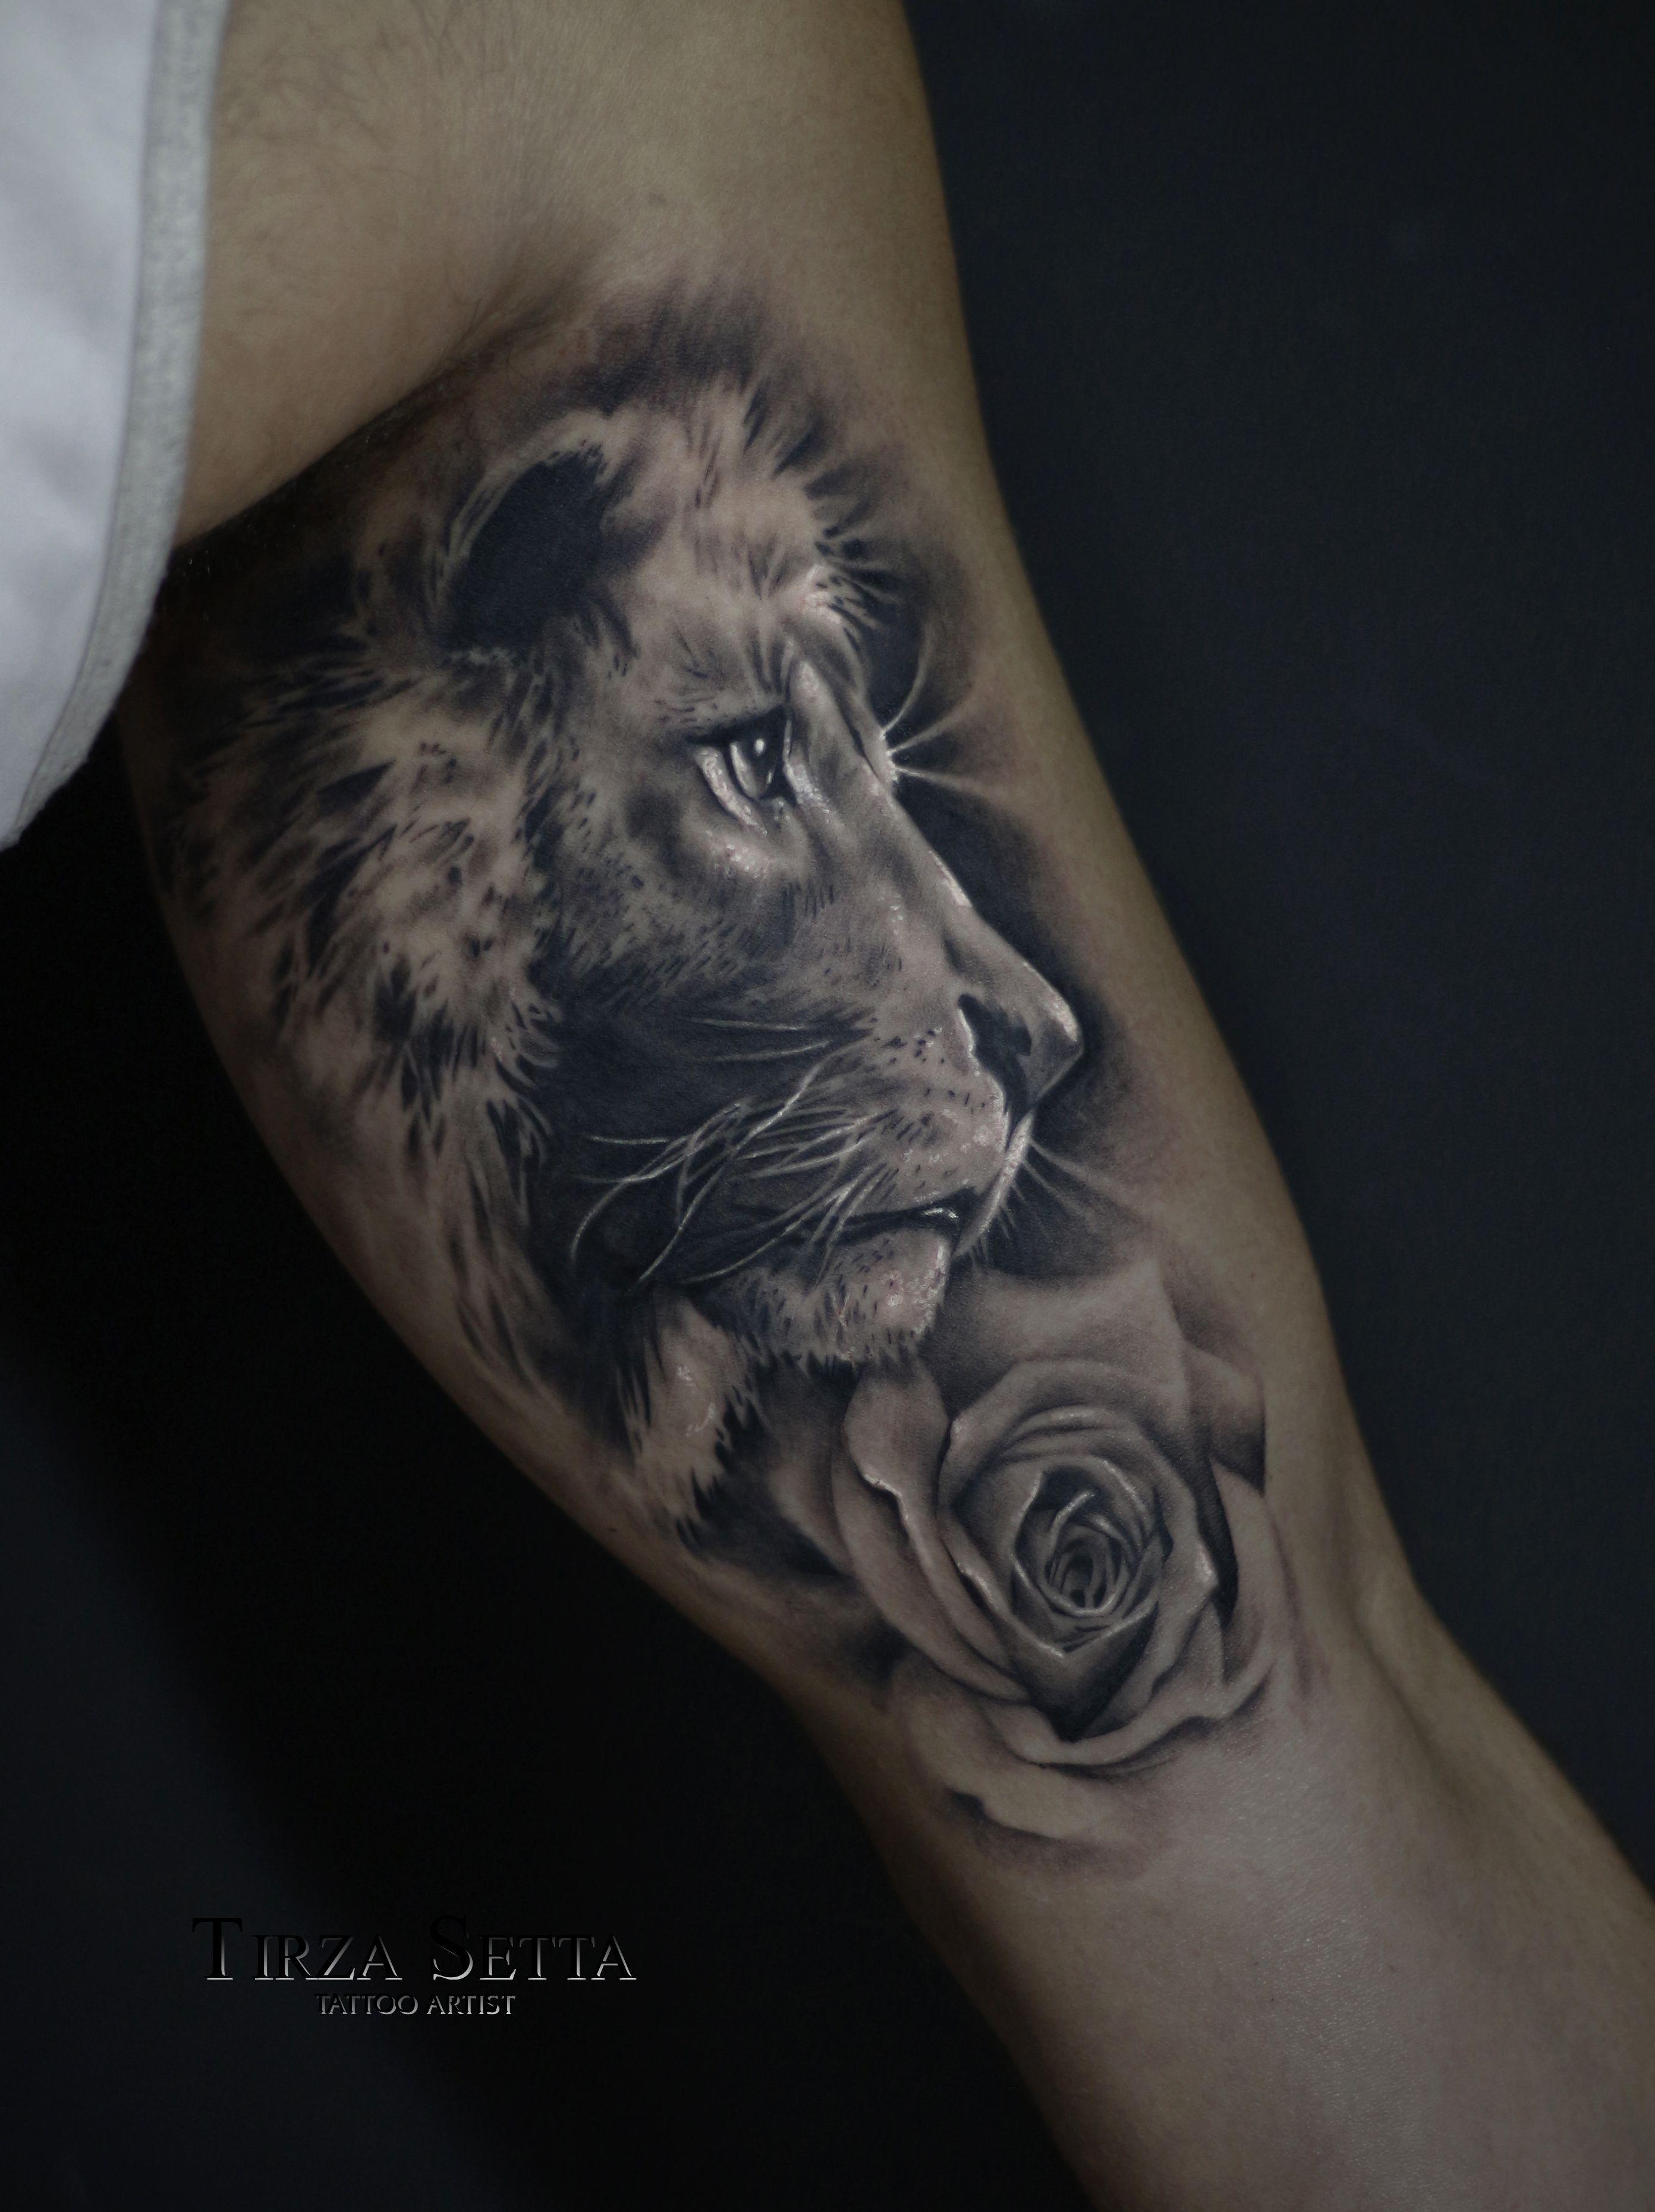 Leao Com Rosa No Biceps Tattoo Blackandgrey Liontattoo Rosetattoo Tirzasettatattoo Tirzasetta Realist Bicep Tattoo Bicep Tattoo Men Inside Bicep Tattoo